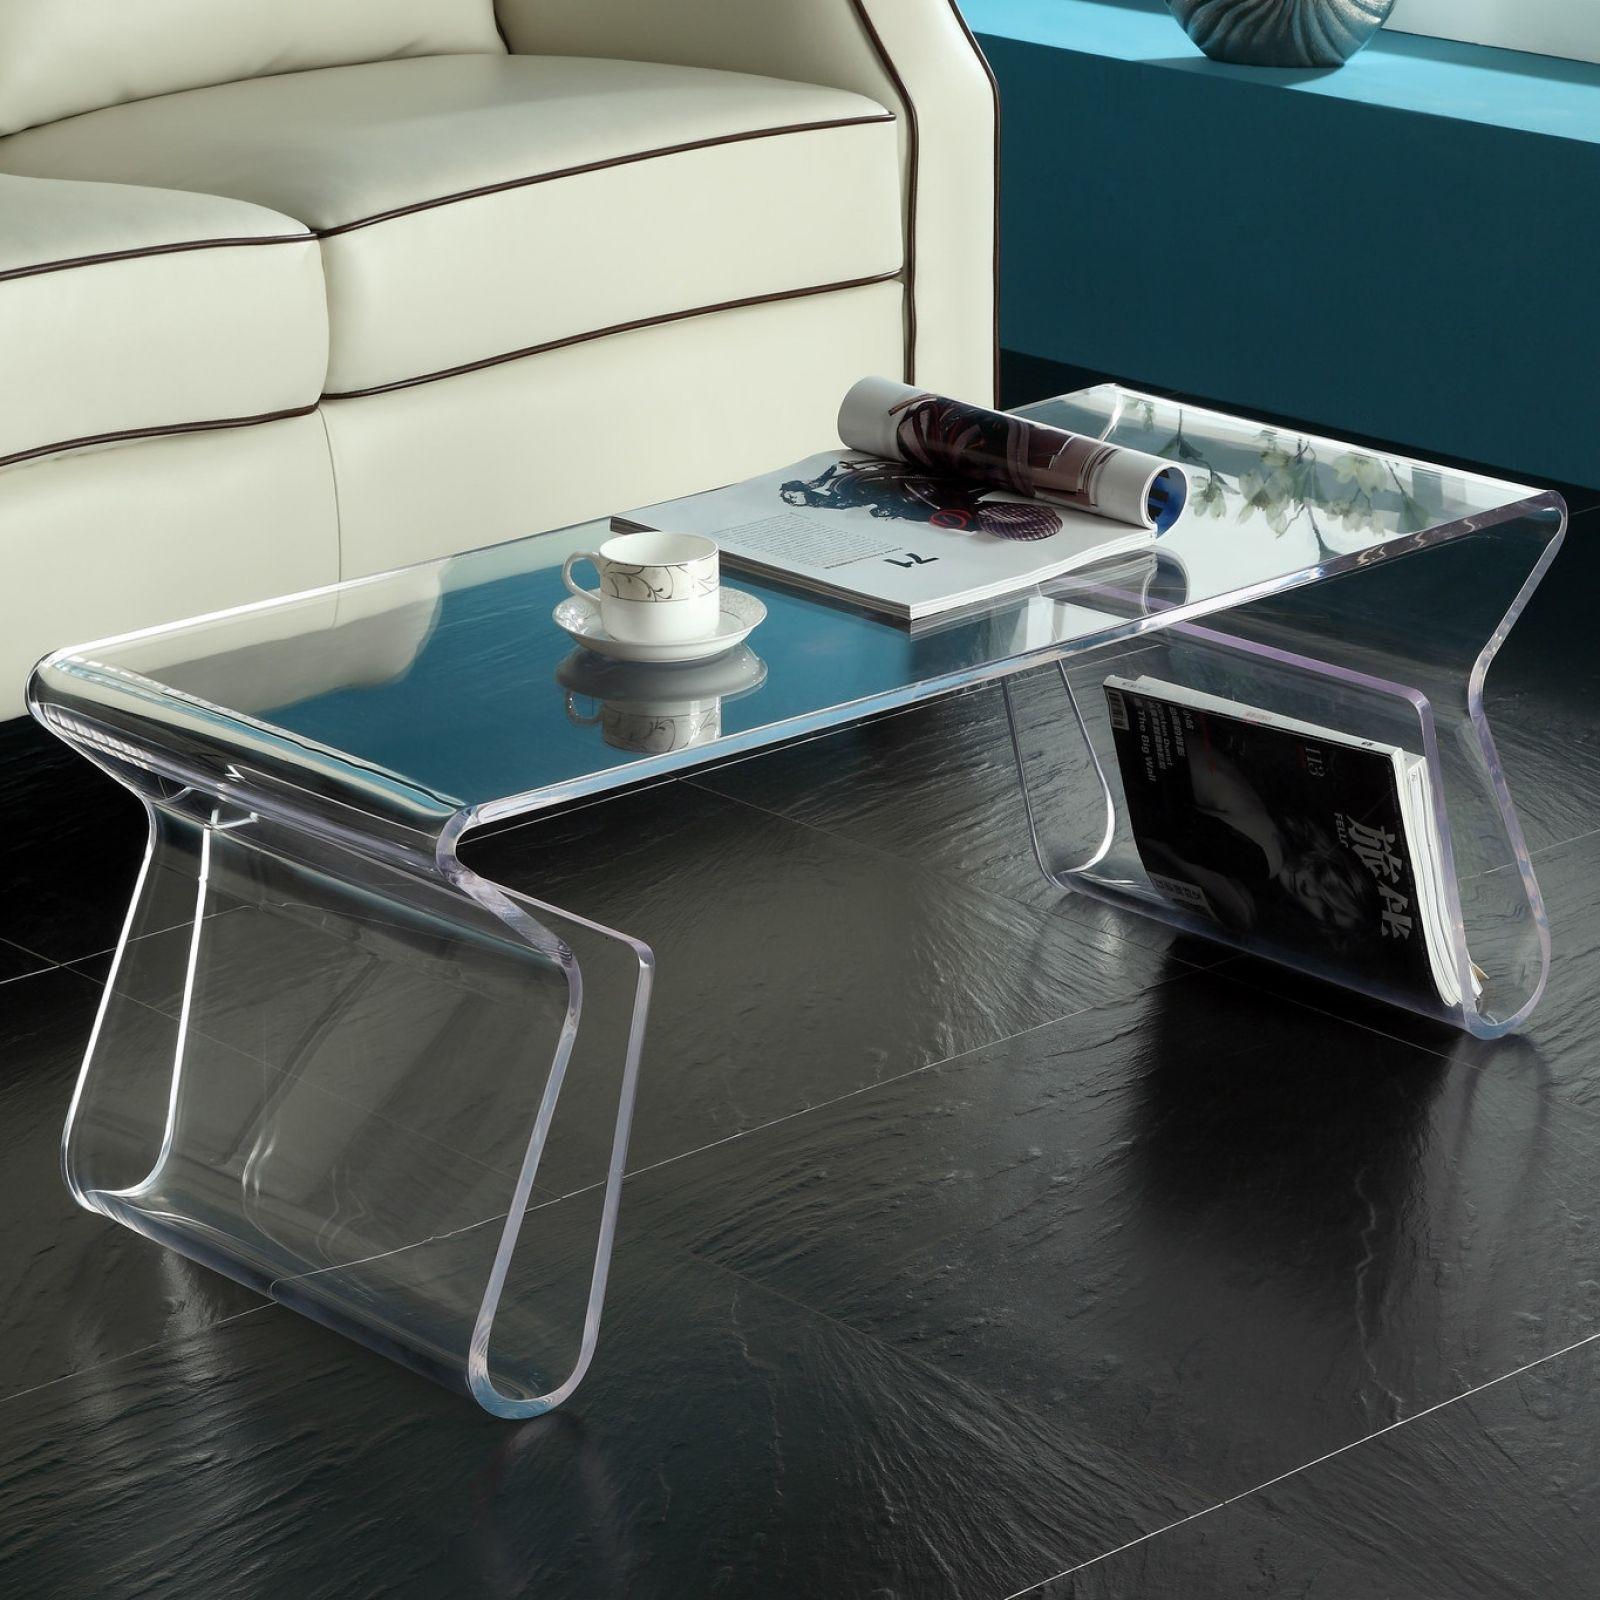 Clear Plastic Sofa Table Acrylic Coffee Table Clear Coffee Table Coffee Table With Shelf [ 1600 x 1600 Pixel ]